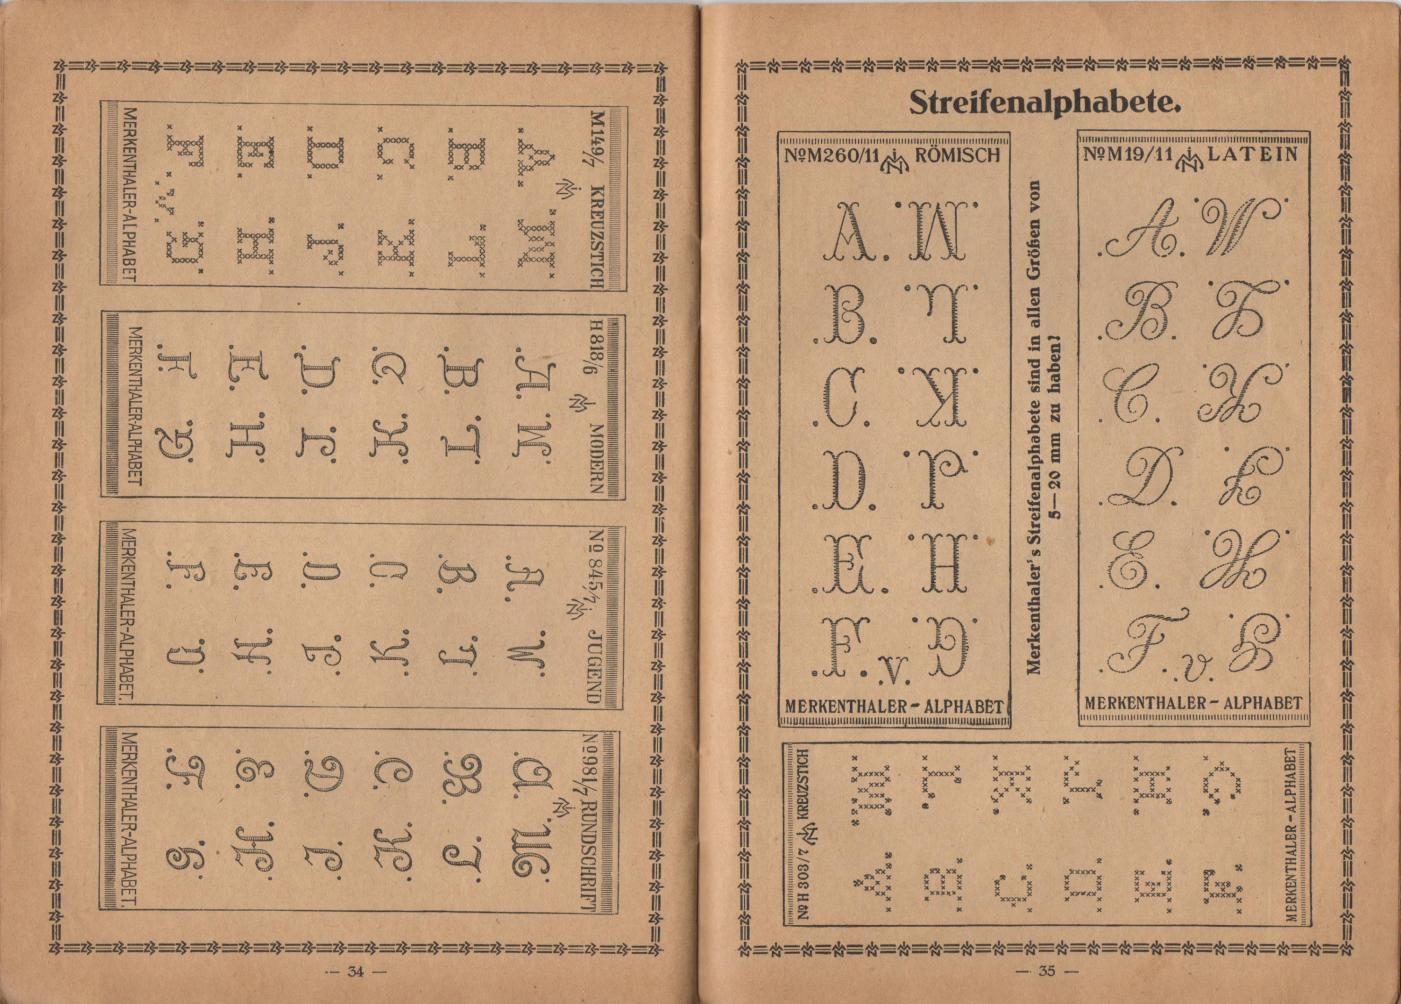 monogramme_34-35.thumb.jpg.9f09e8fe3ad13a36a9482a5cf8ba508e.jpg